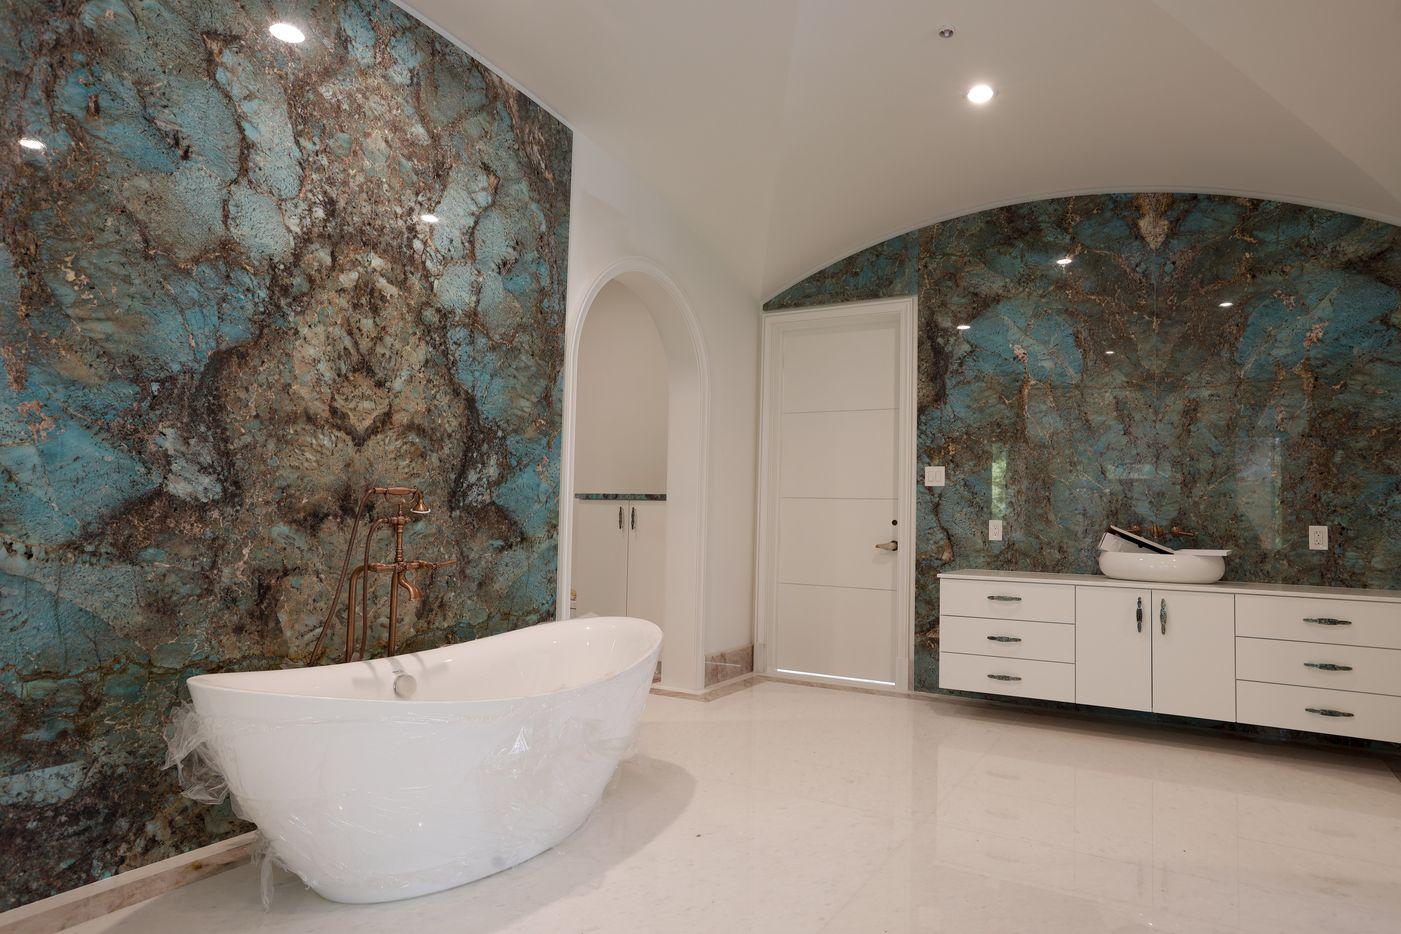 The master bathroom has Amazonite walls and a rose quartz border along the floor.